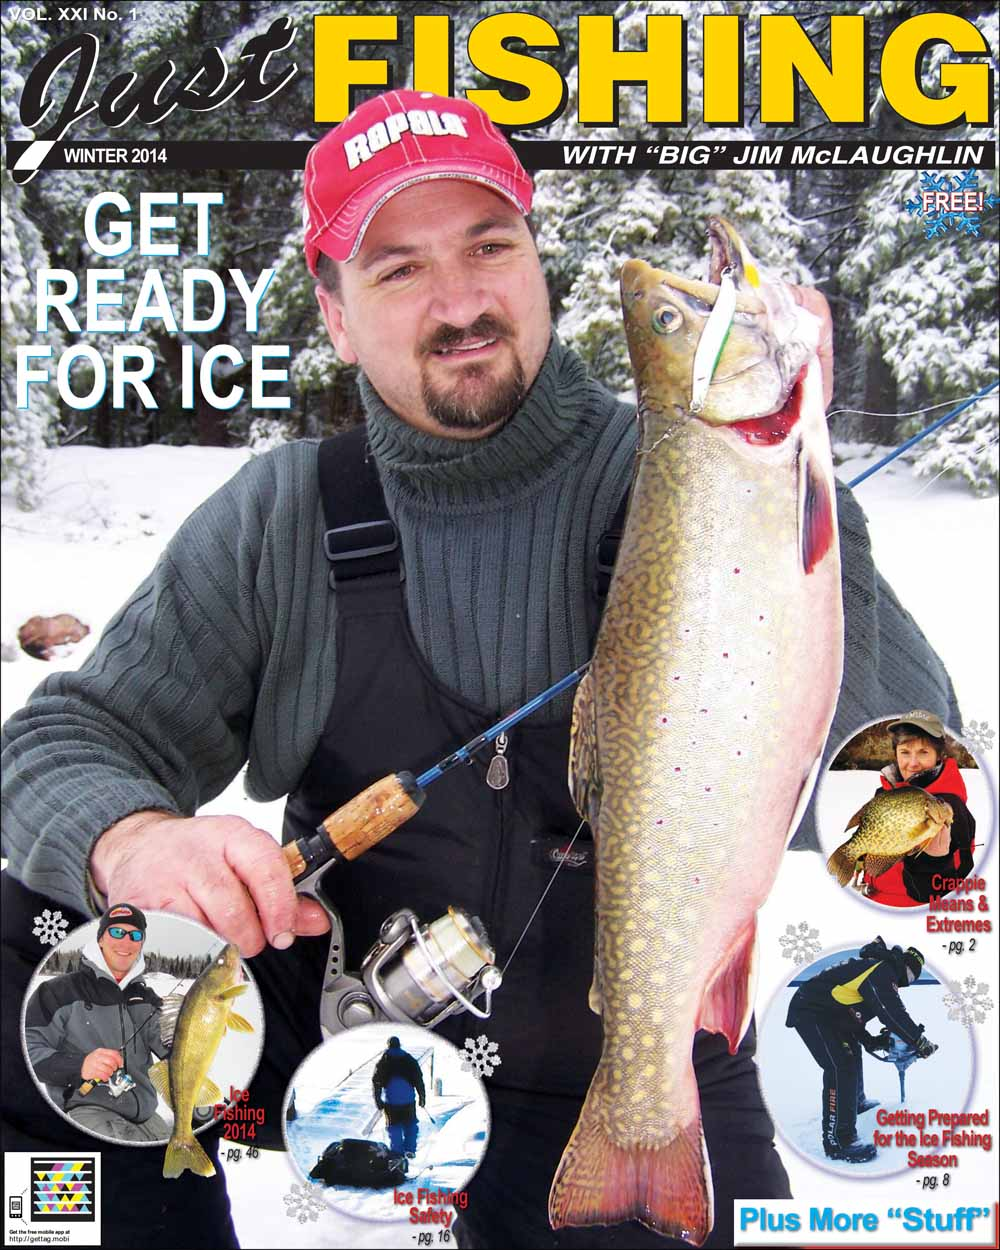 Just Fishing Winter 2014